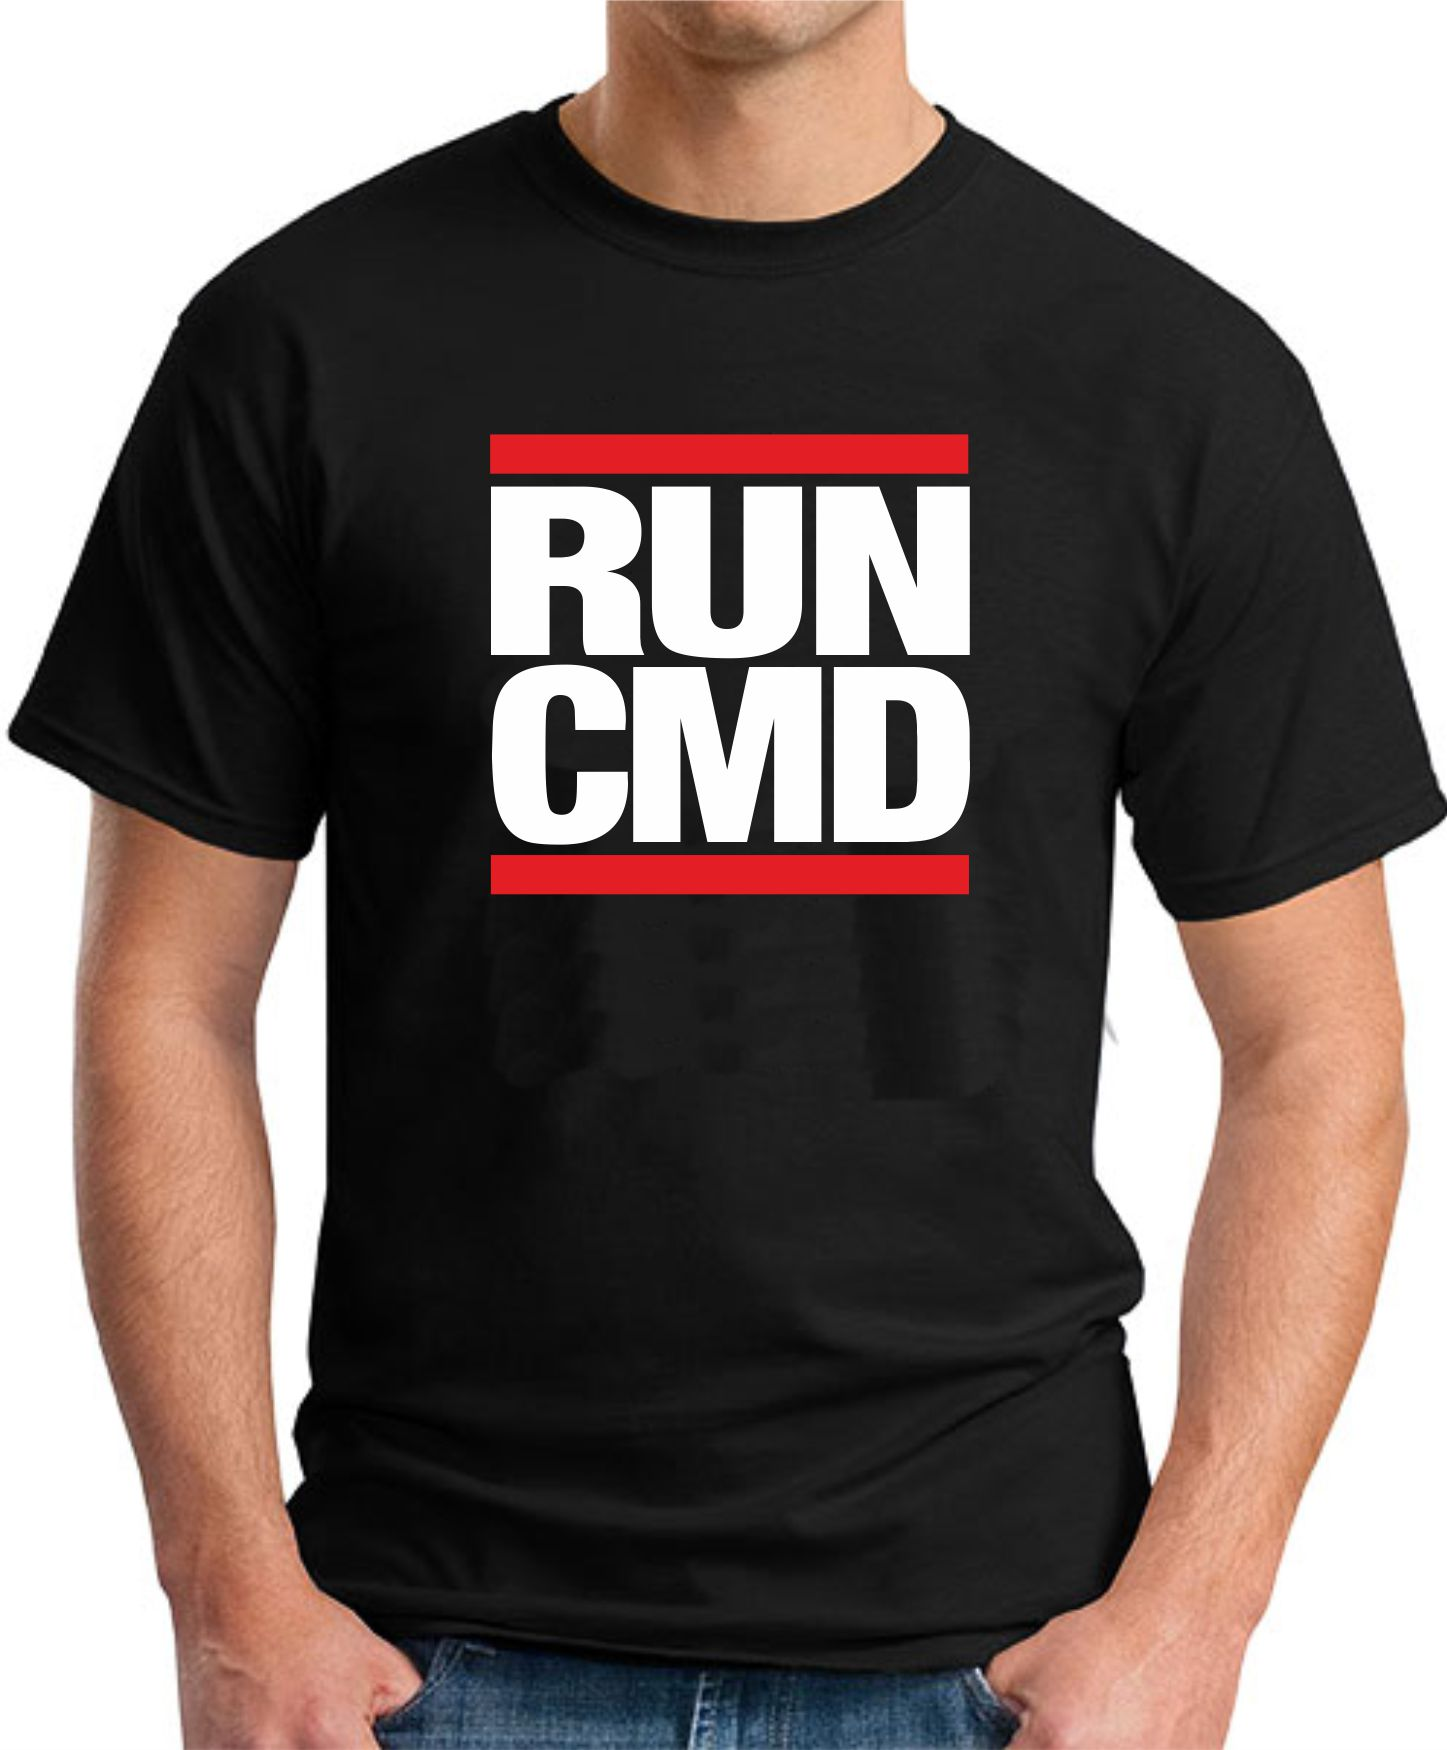 RUN CMD BLACK